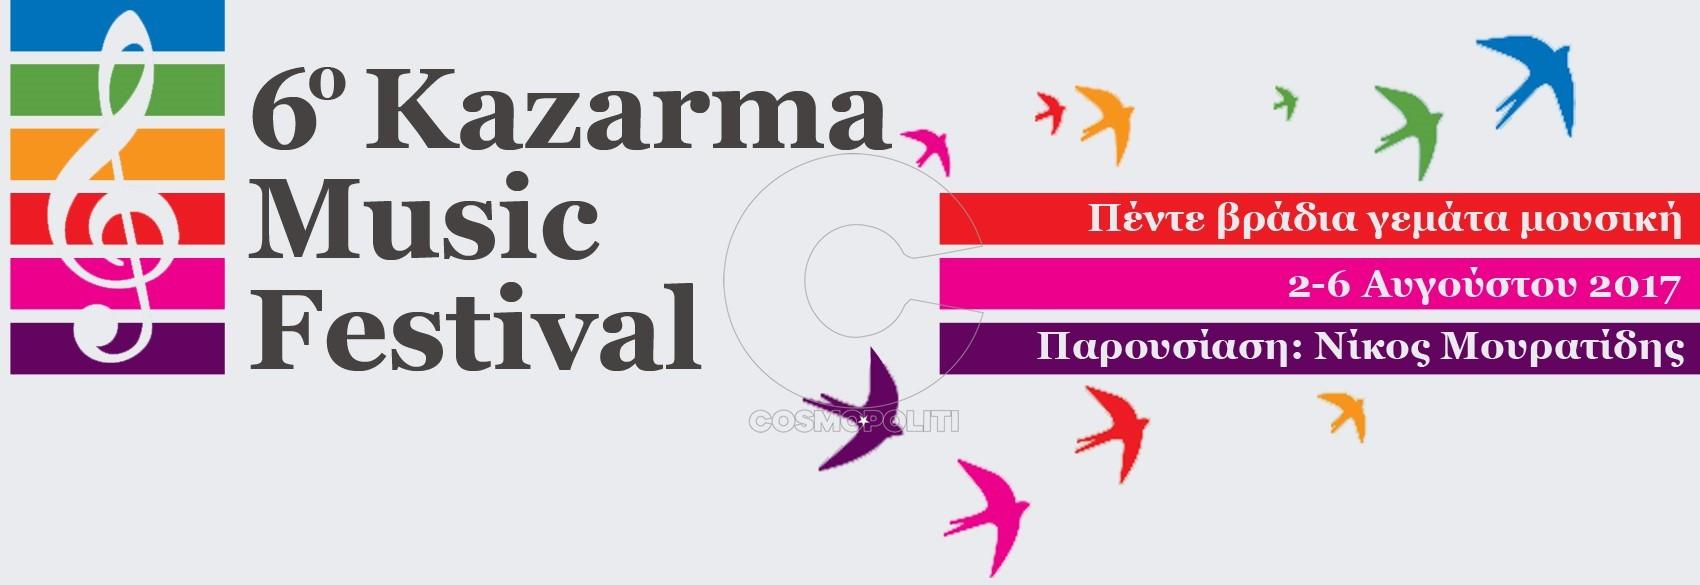 6 Kazarma Music Festival (Banner Facebook) 2 - Αντιγραφή